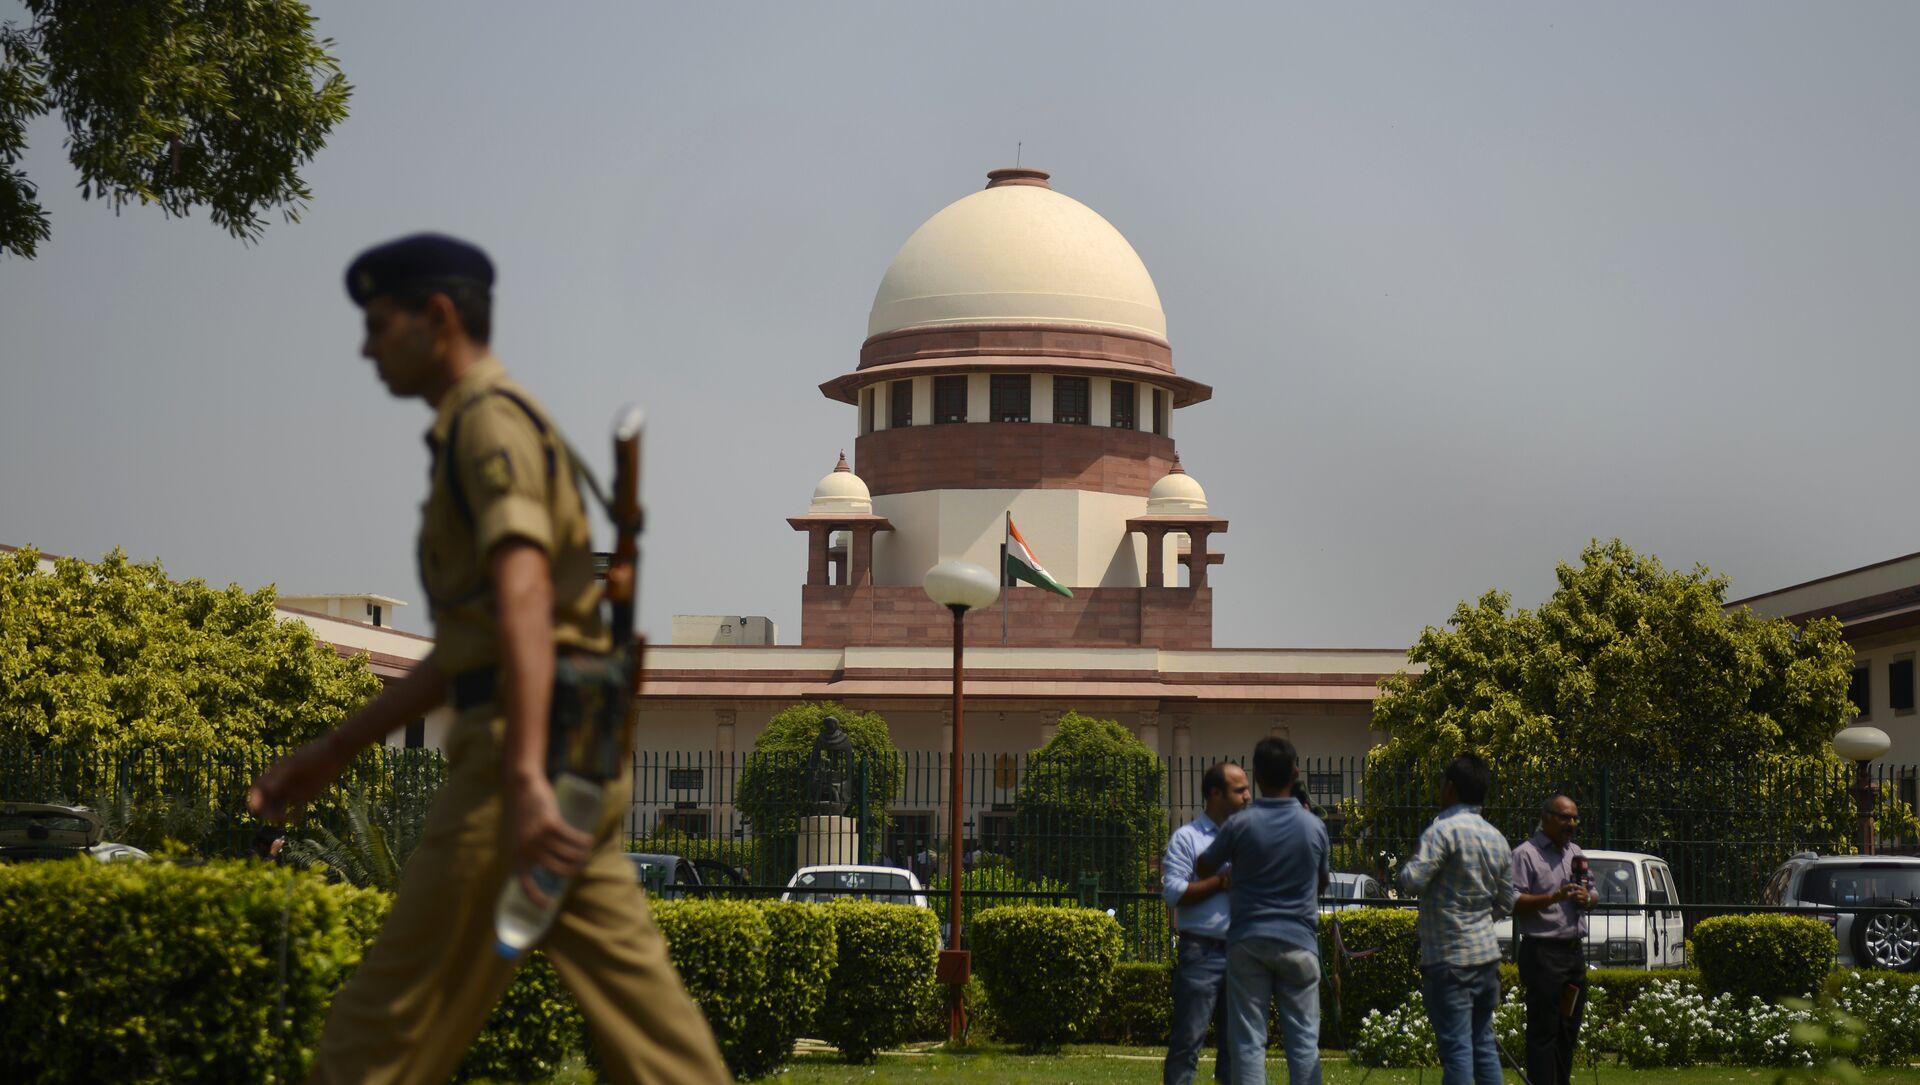 Indian Supreme court in New Delhi - Sputnik International, 1920, 27.07.2021